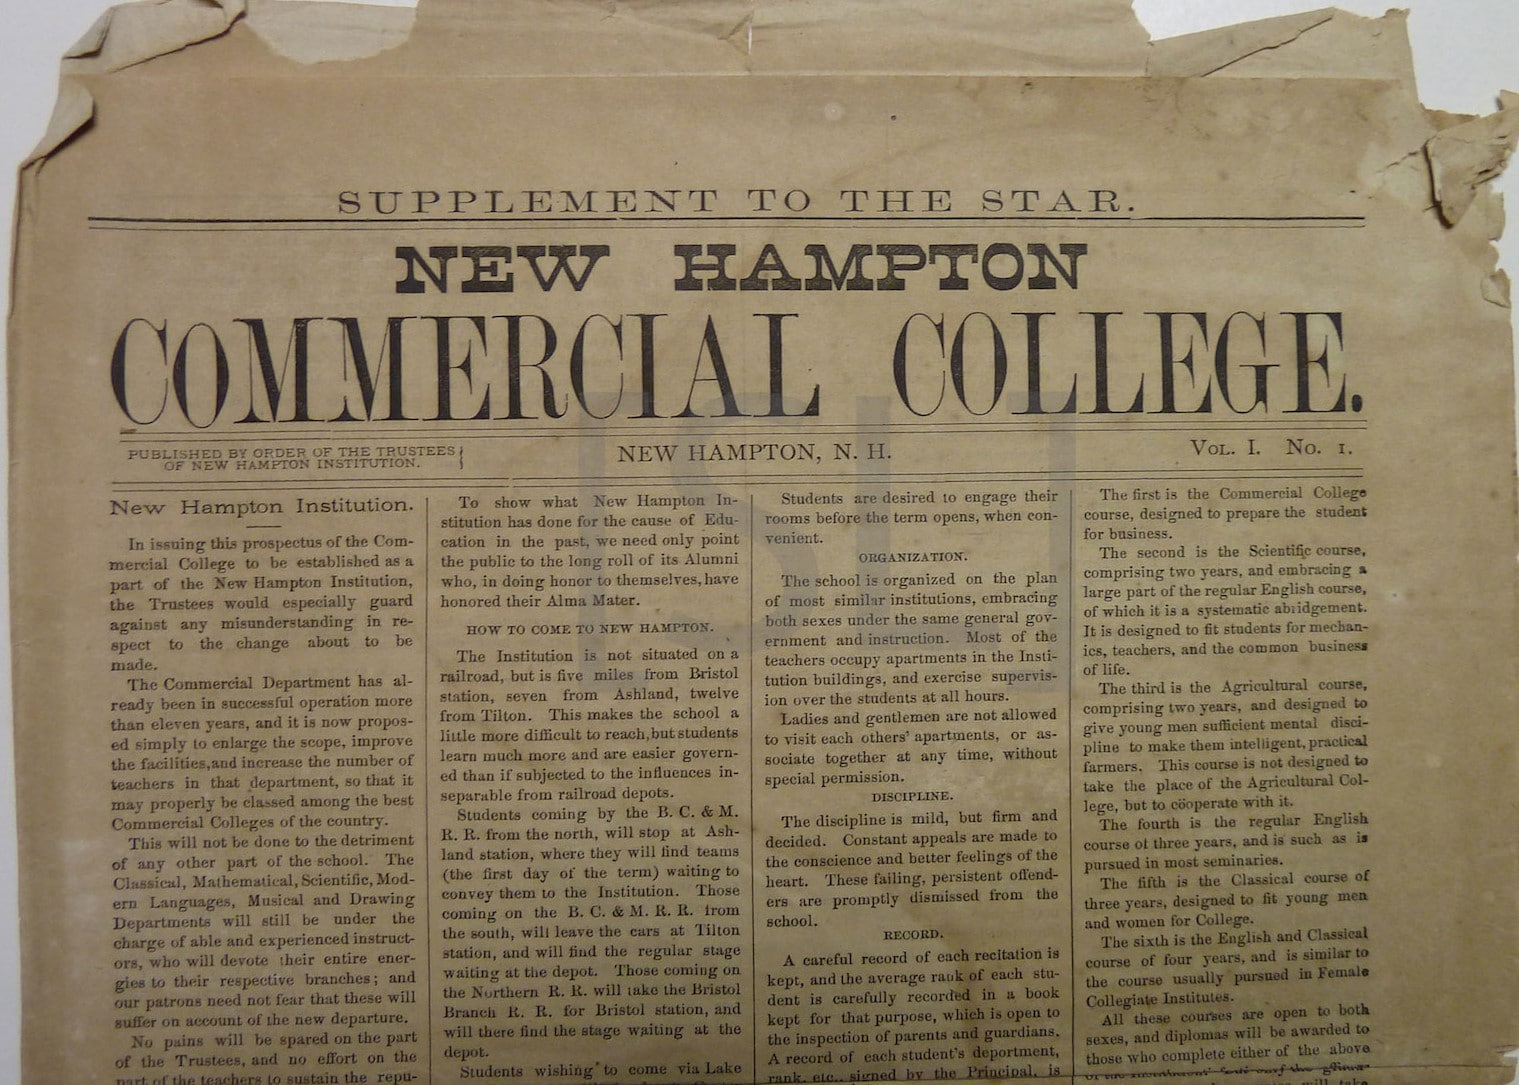 New Hampton Commercial College